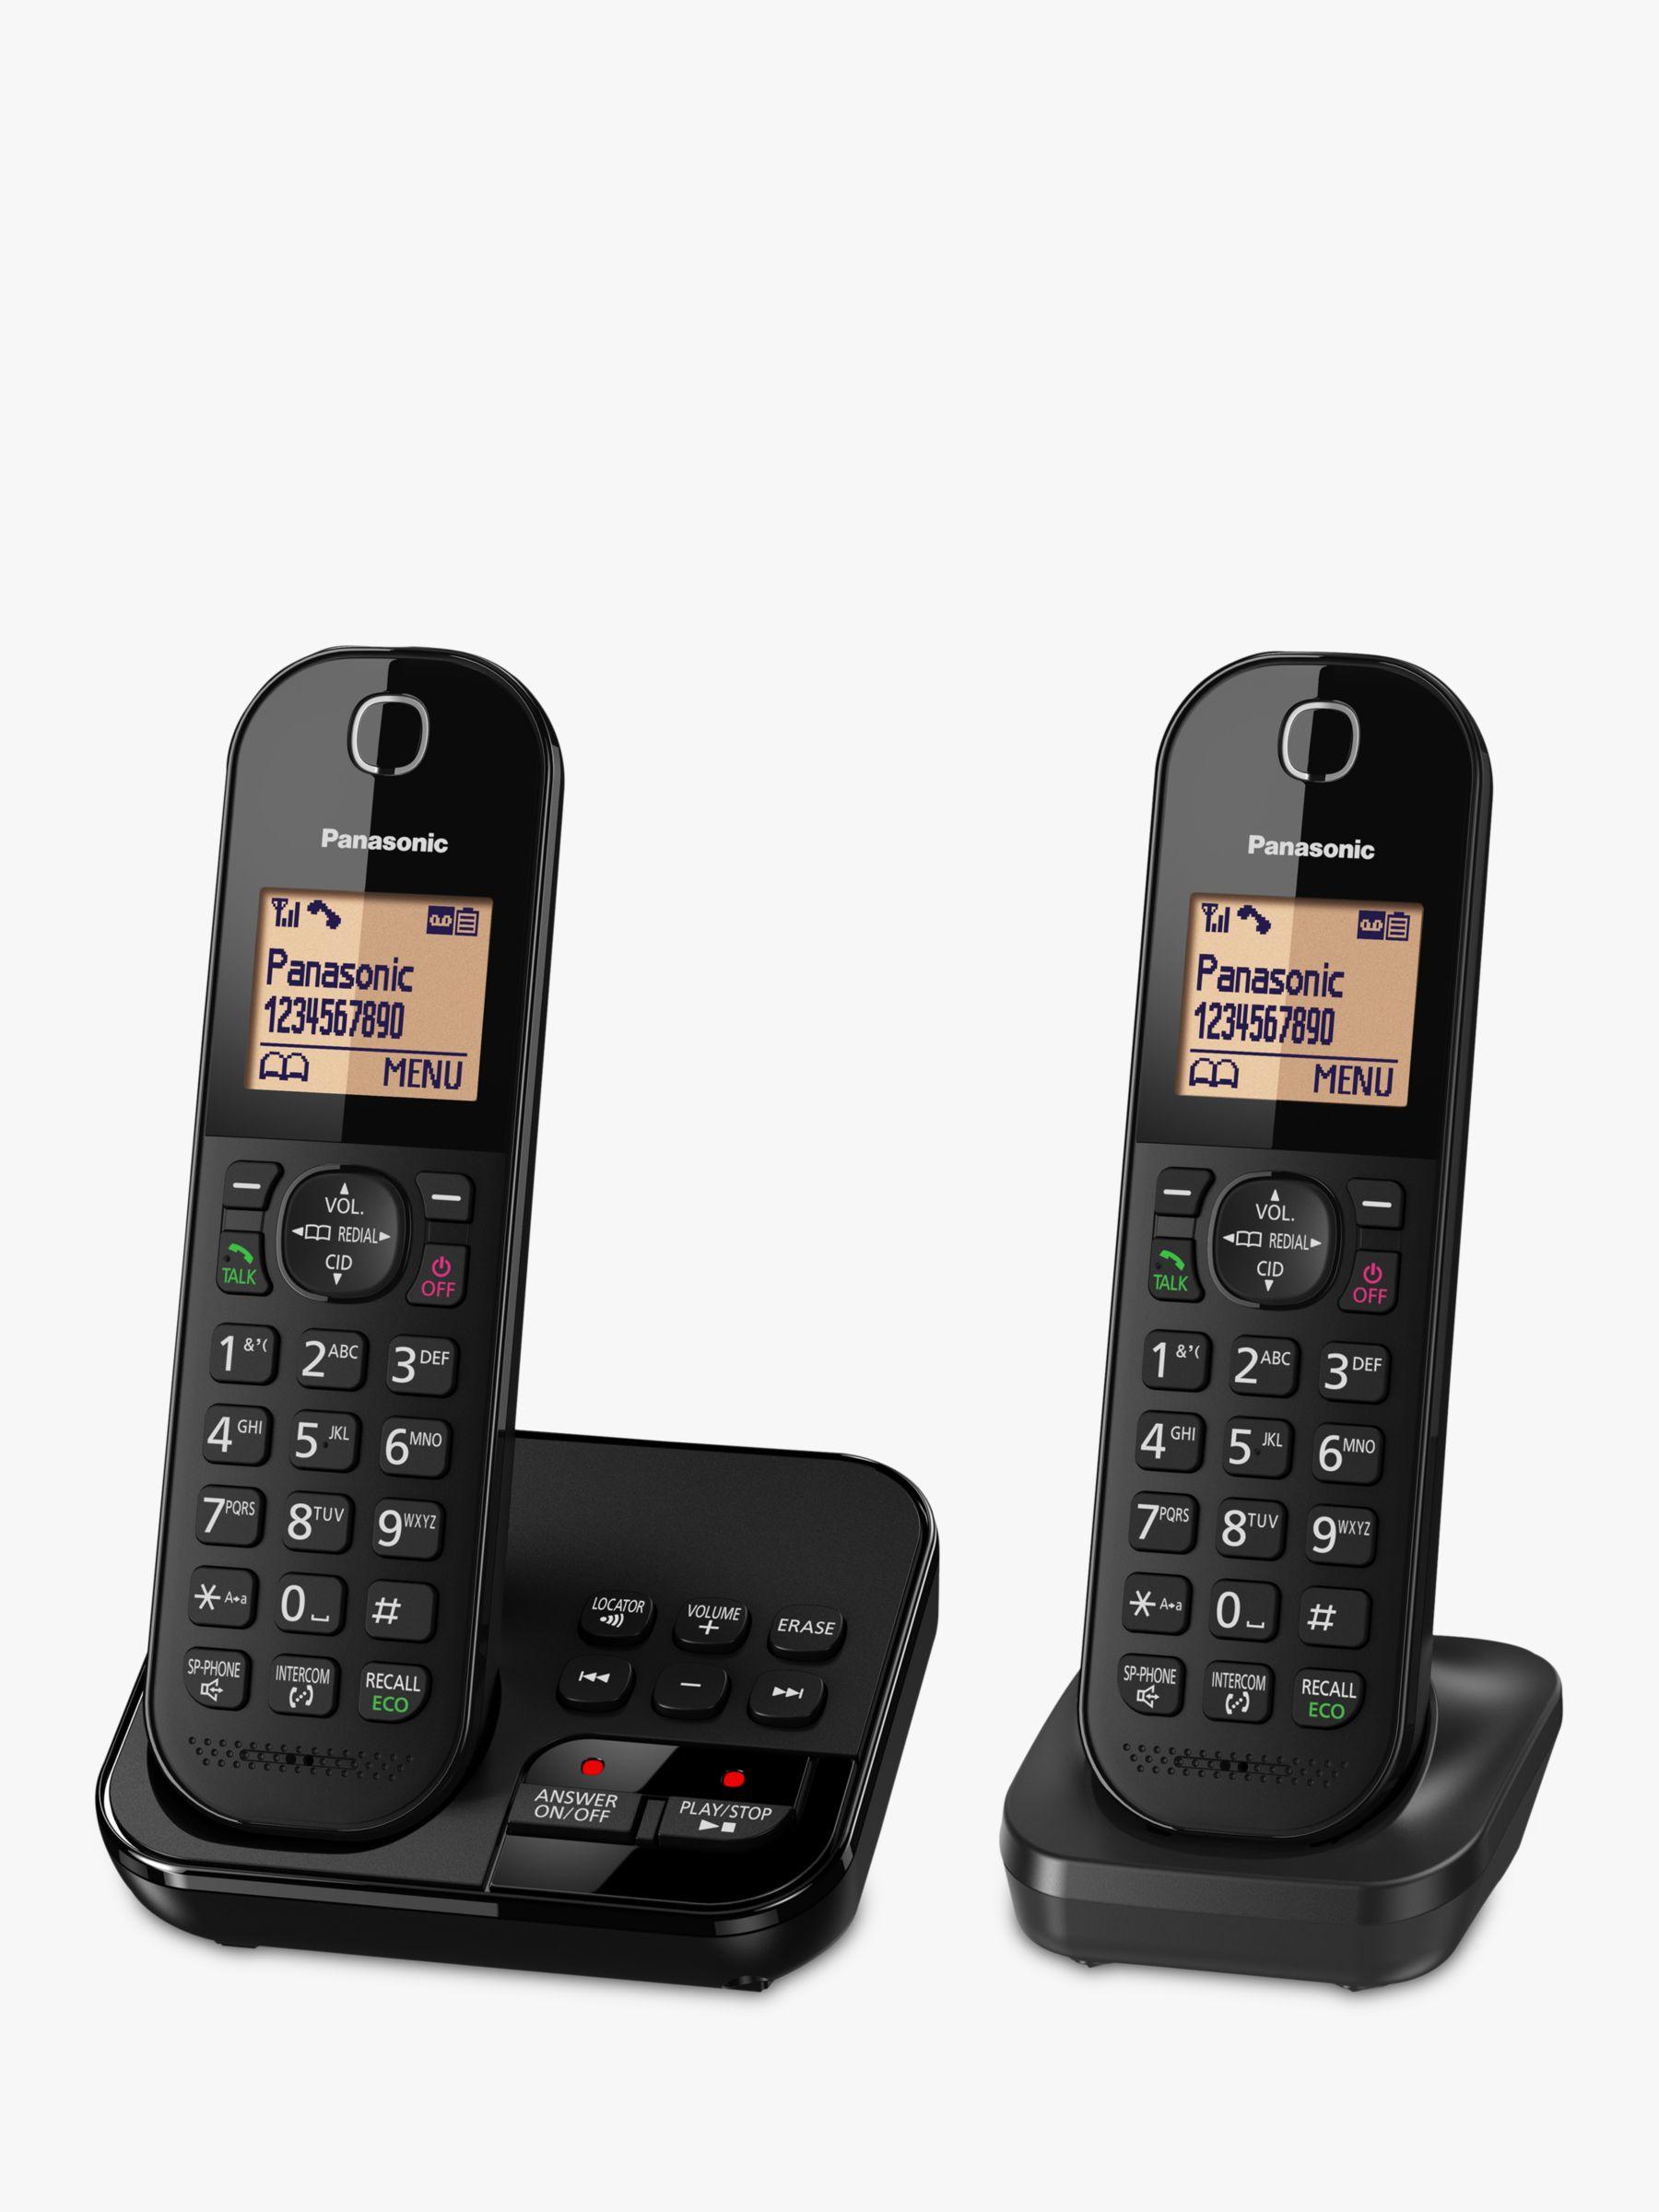 Panasonic Panasonic KX-TGC422EB Digital Cordless Telephone with 1.6 Backlit LCD Screen, Nuisance Call Blocker & Answering Machine, Twin DECT